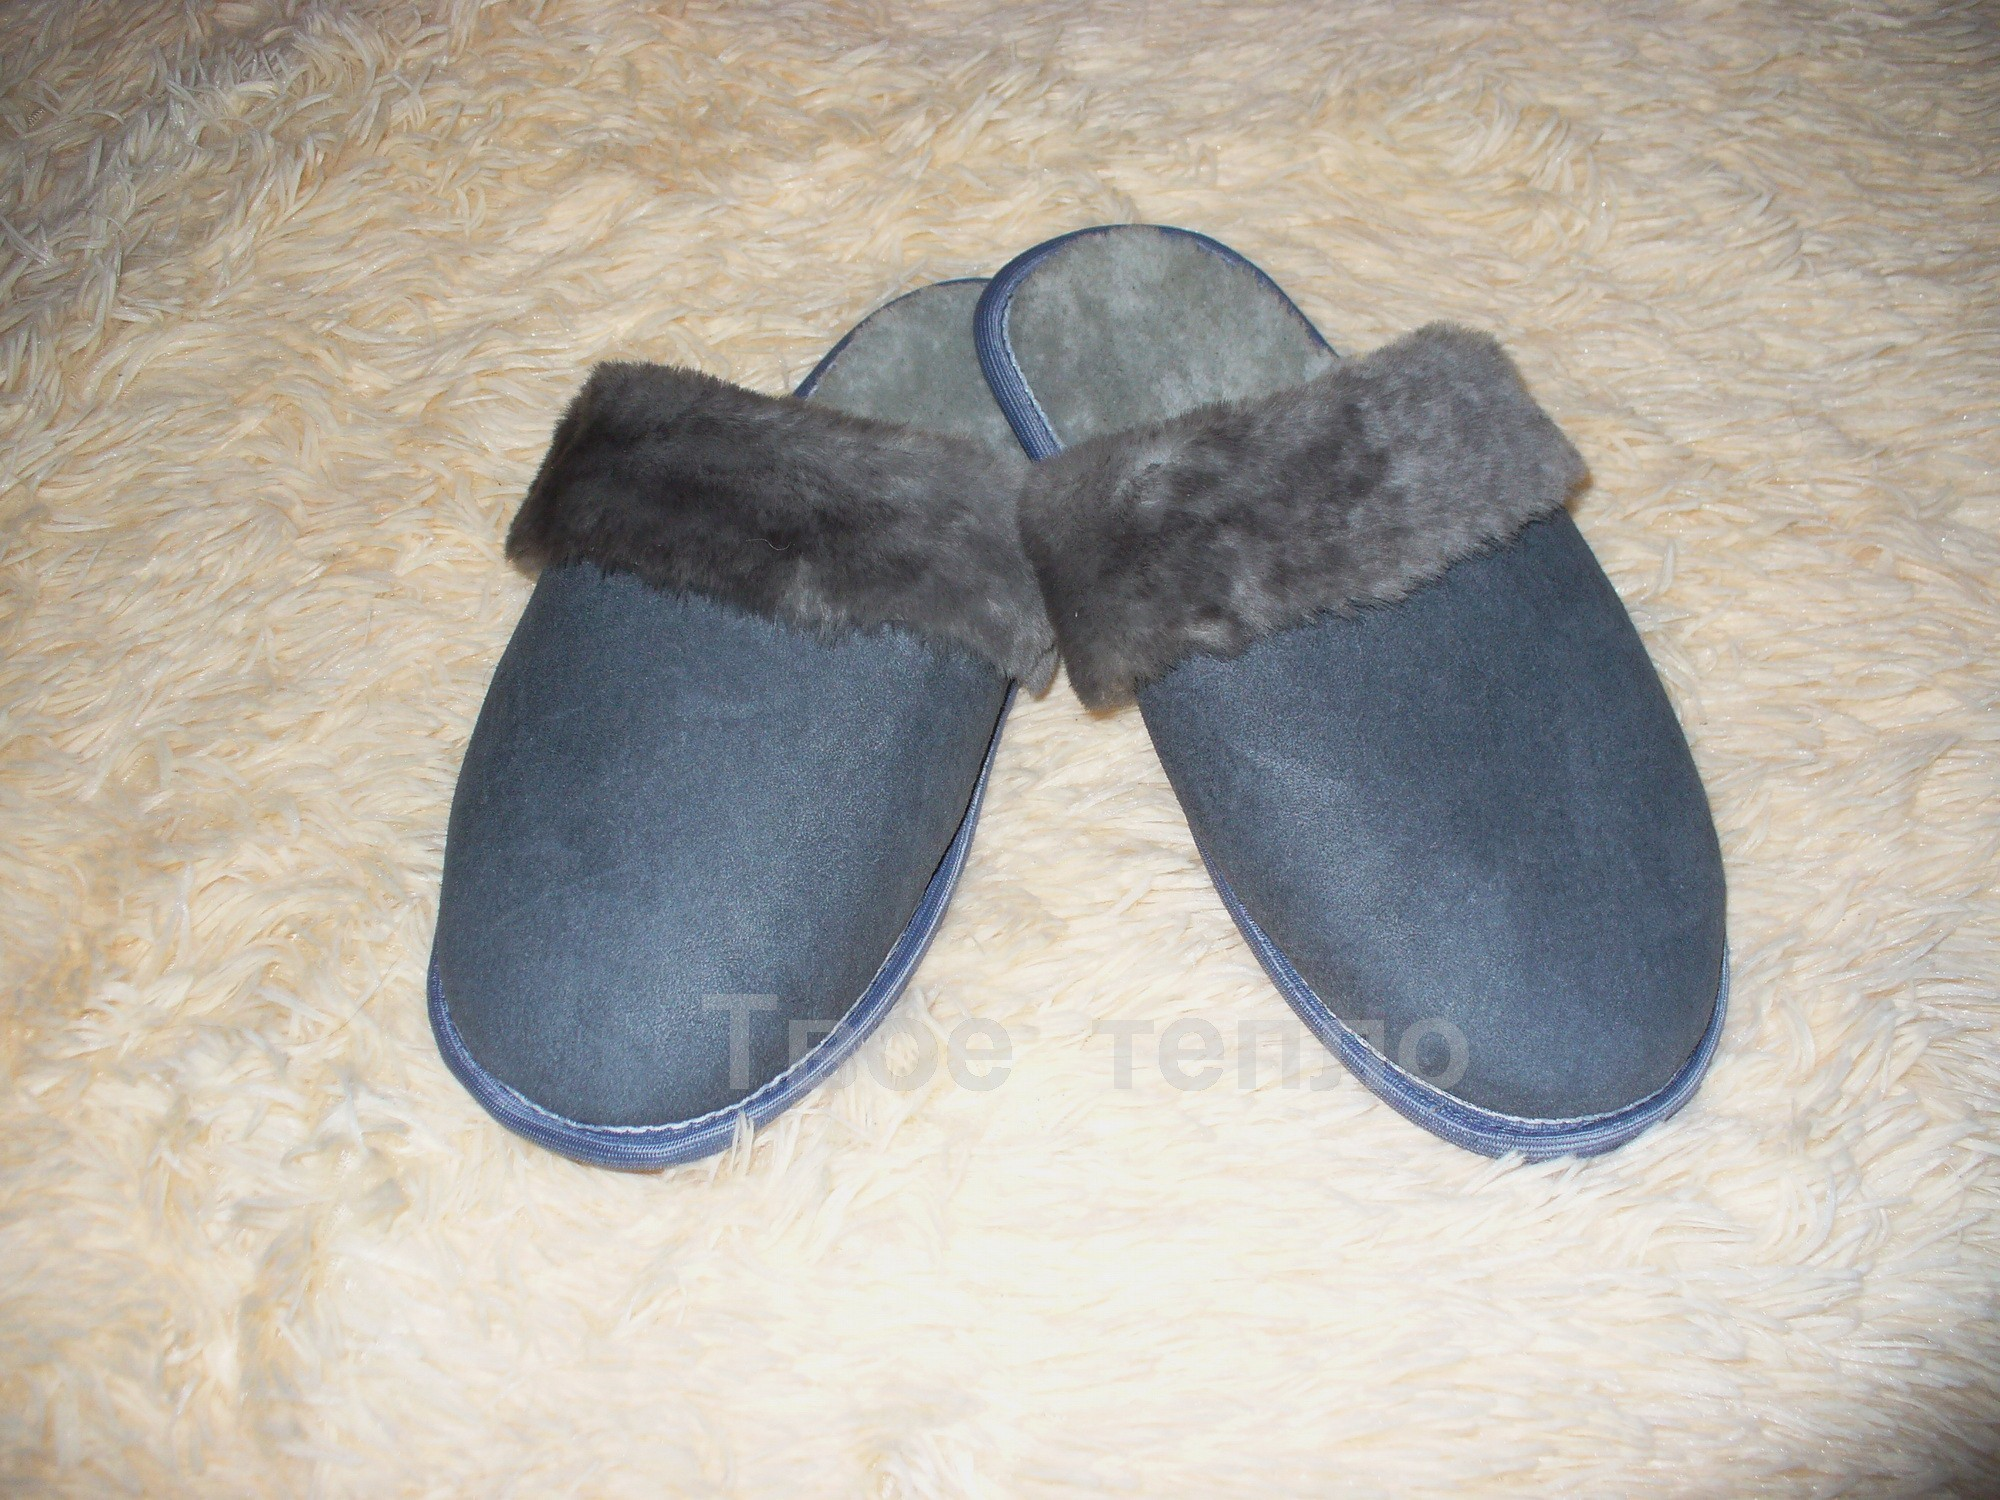 Мужские тапочки шлепки из дубленой кожи